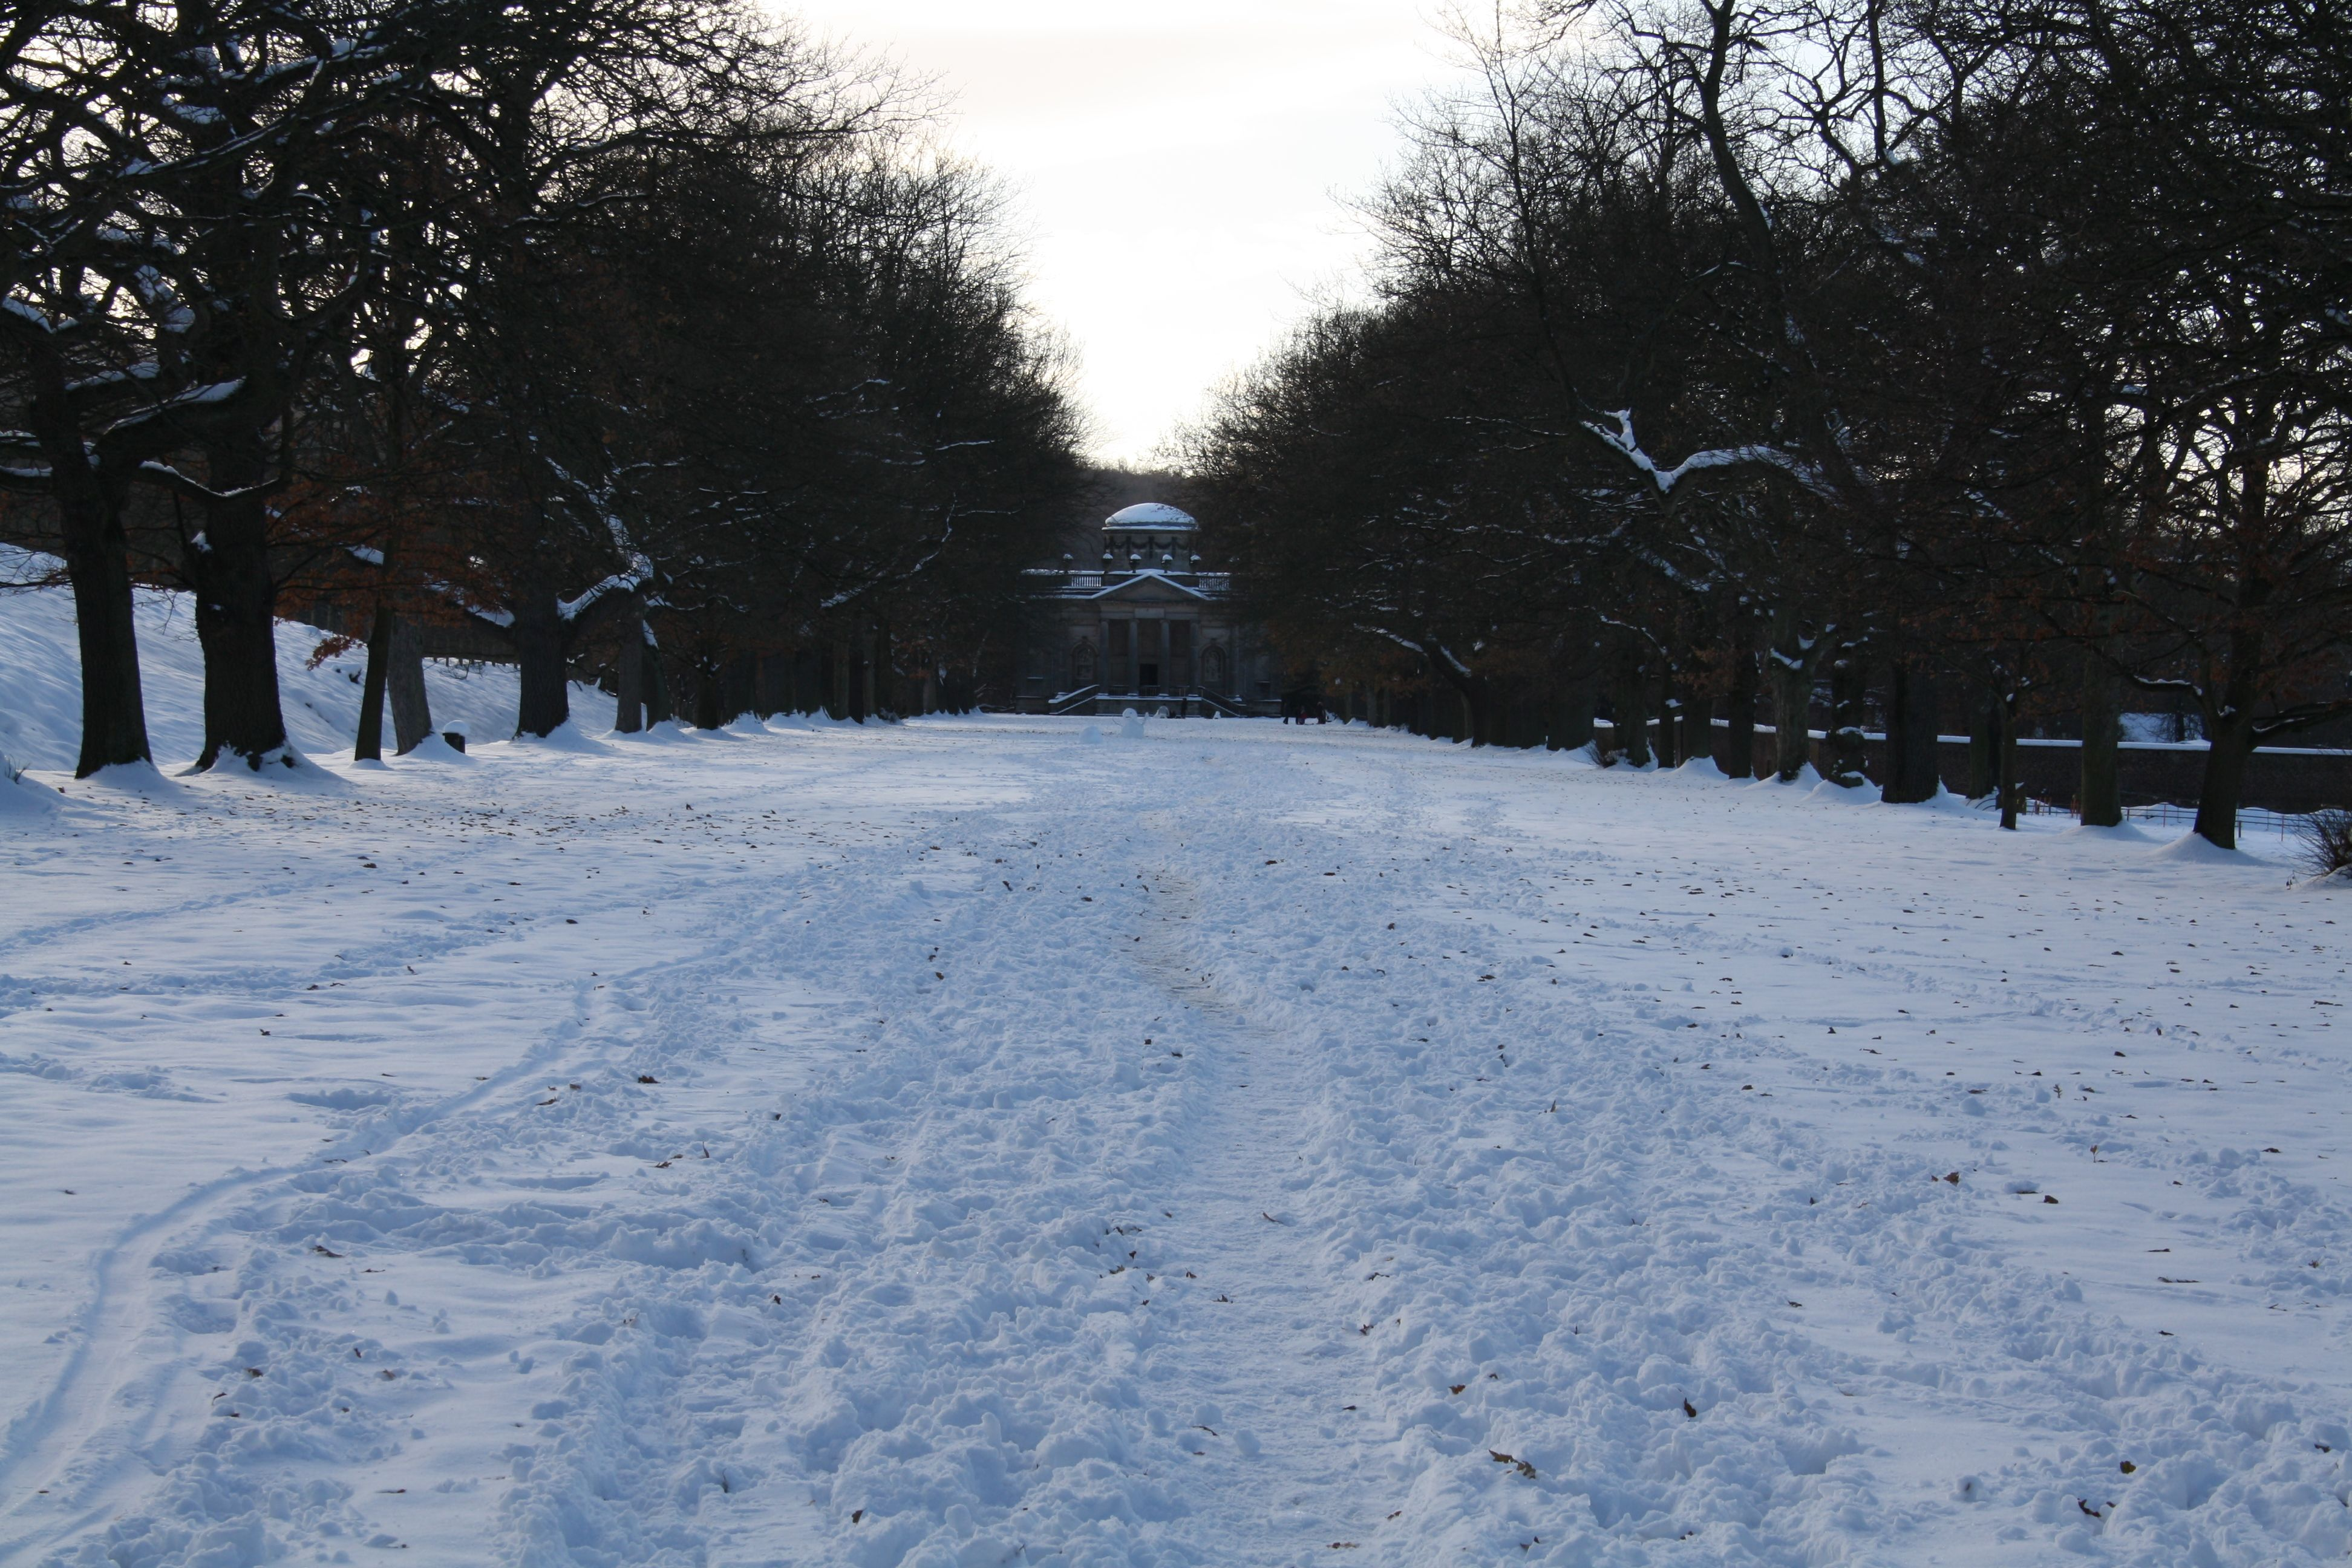 The Grand Walk in Snow December 2010